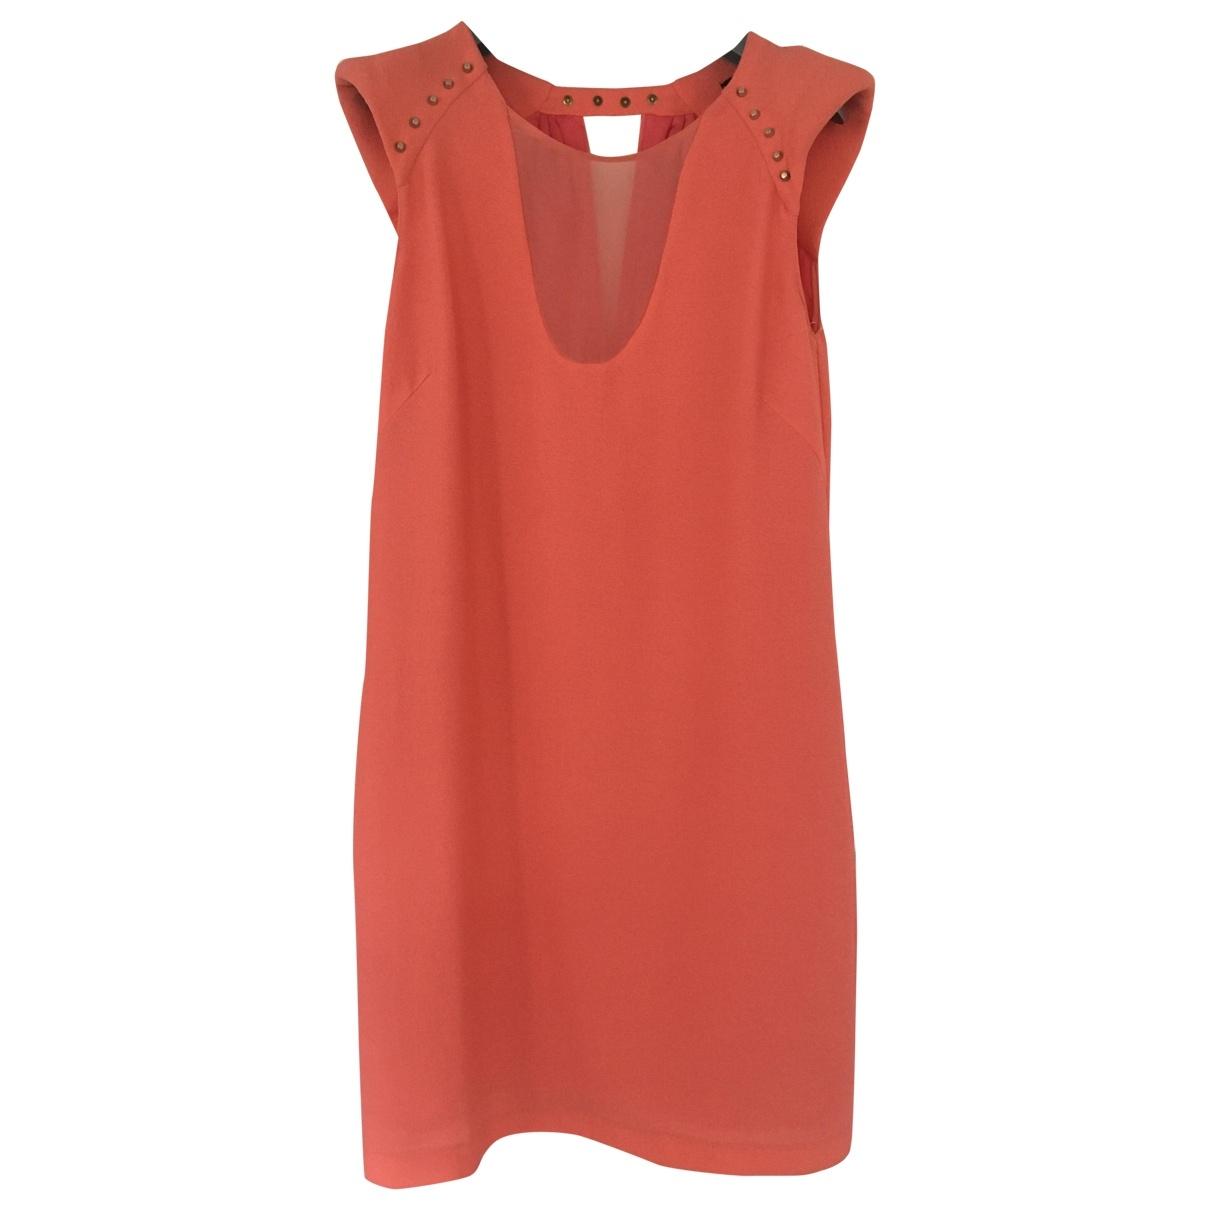 Zara \N Orange dress for Women S International